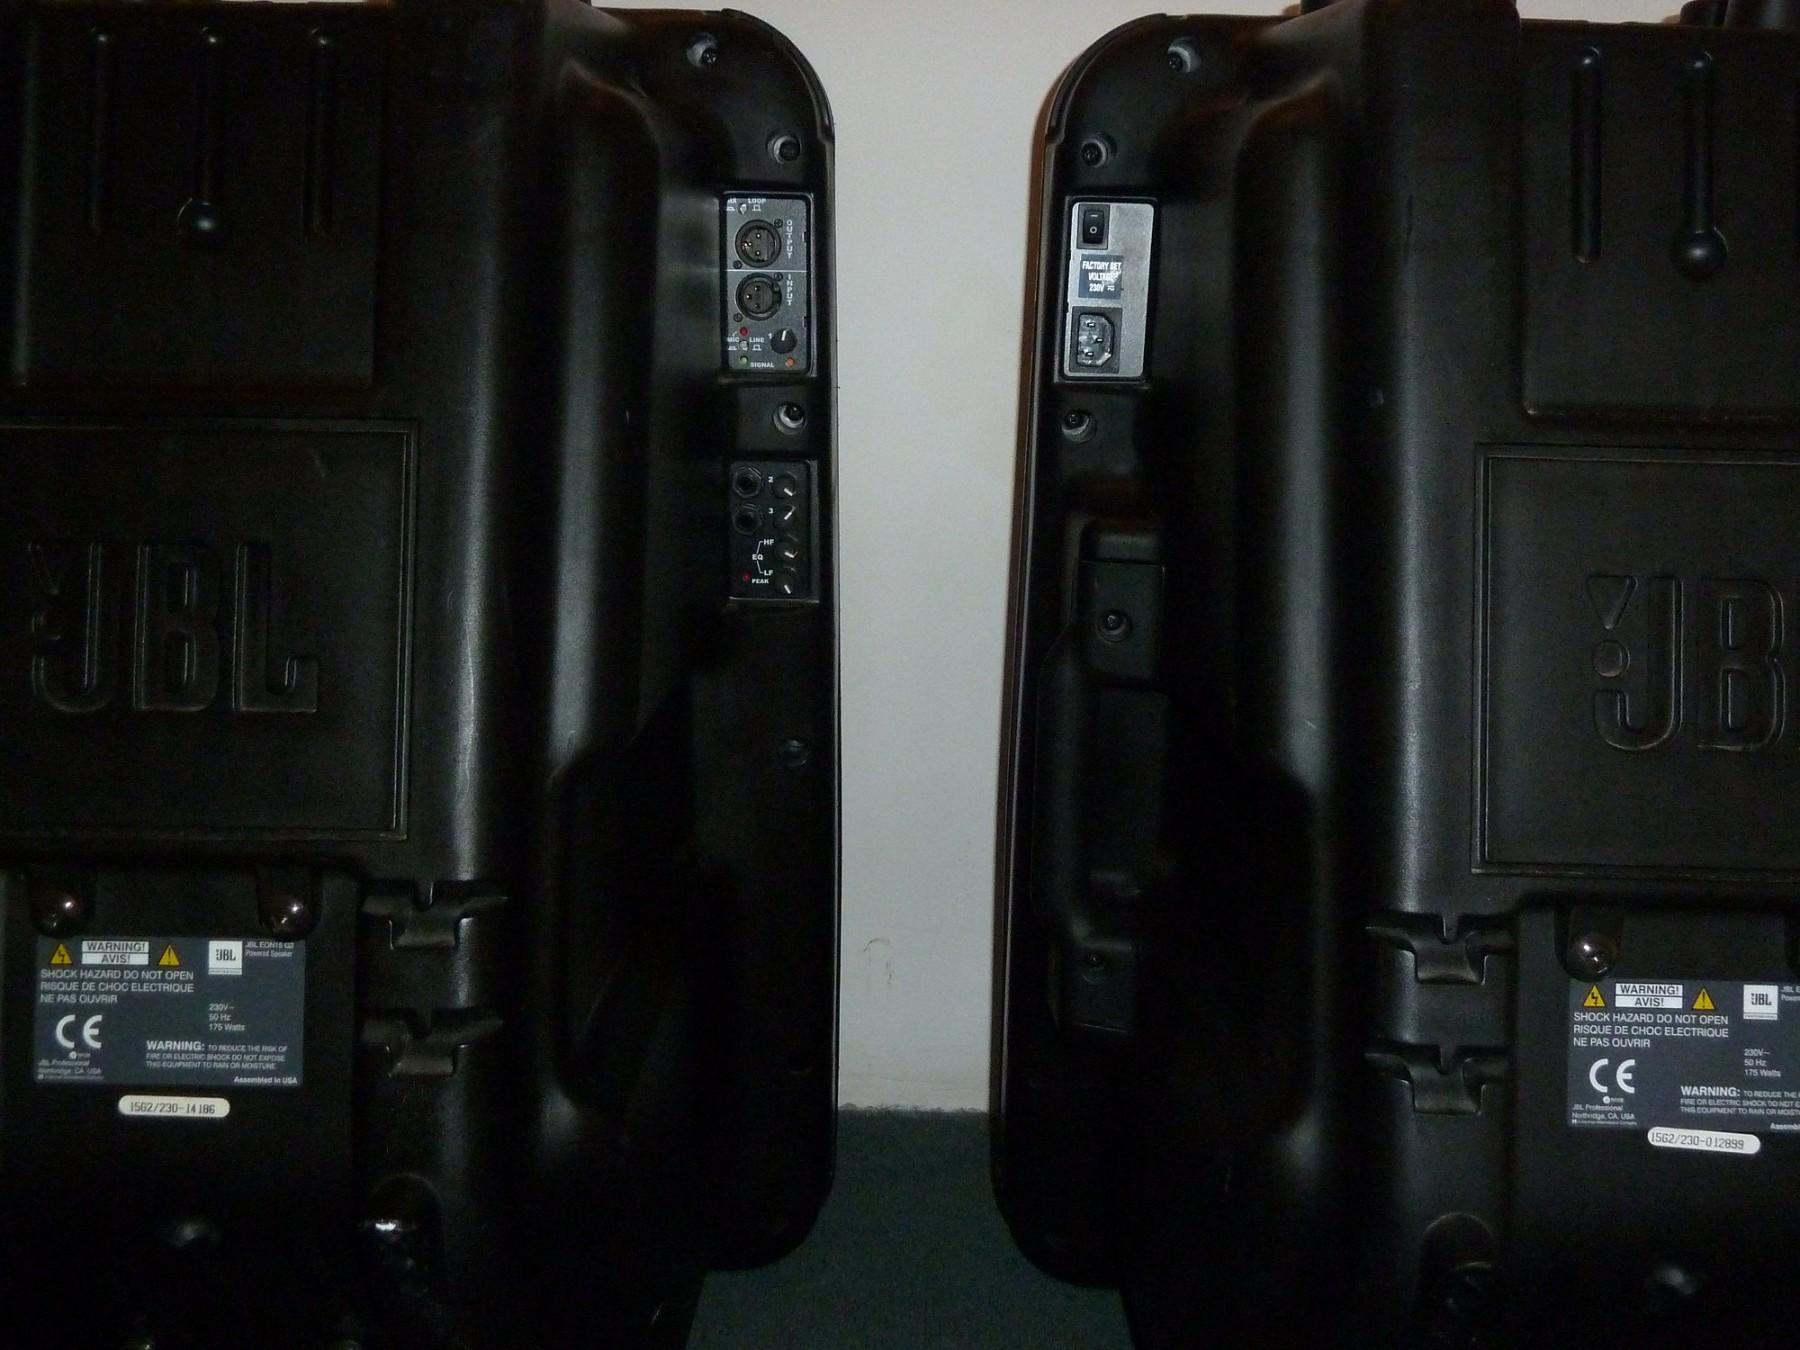 JBL EON 15 G2 PROFESIONALNO OZVUCENJE (51603235) - Limundo.com